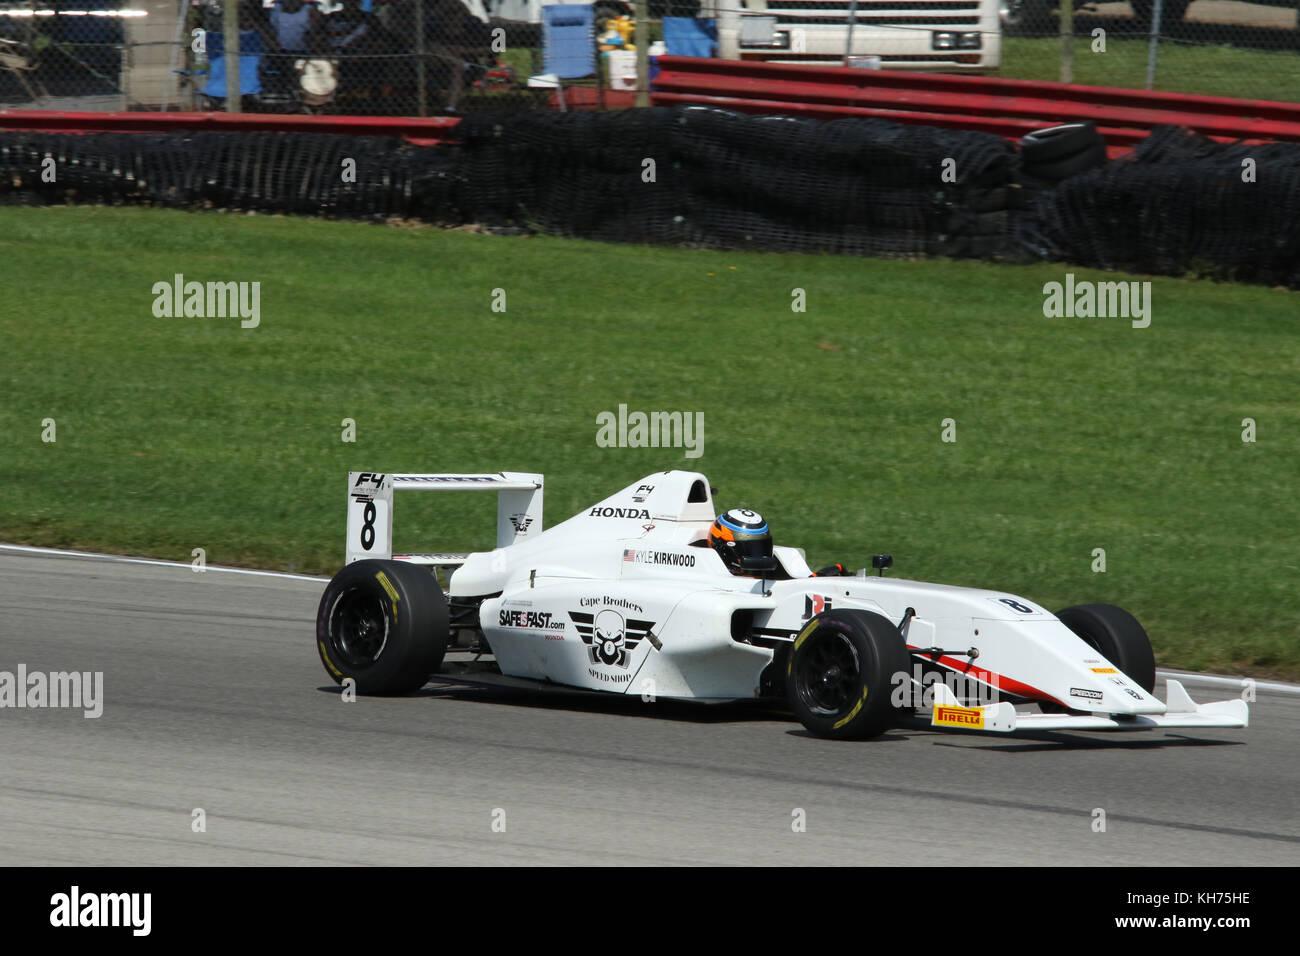 Kyle Kirkwood. Auto 8. Sponsor Kap Motorsport. Formel 4 Rennen. Mid-Ohio Sports Car Course. Lexington, Mansfield, Stockbild